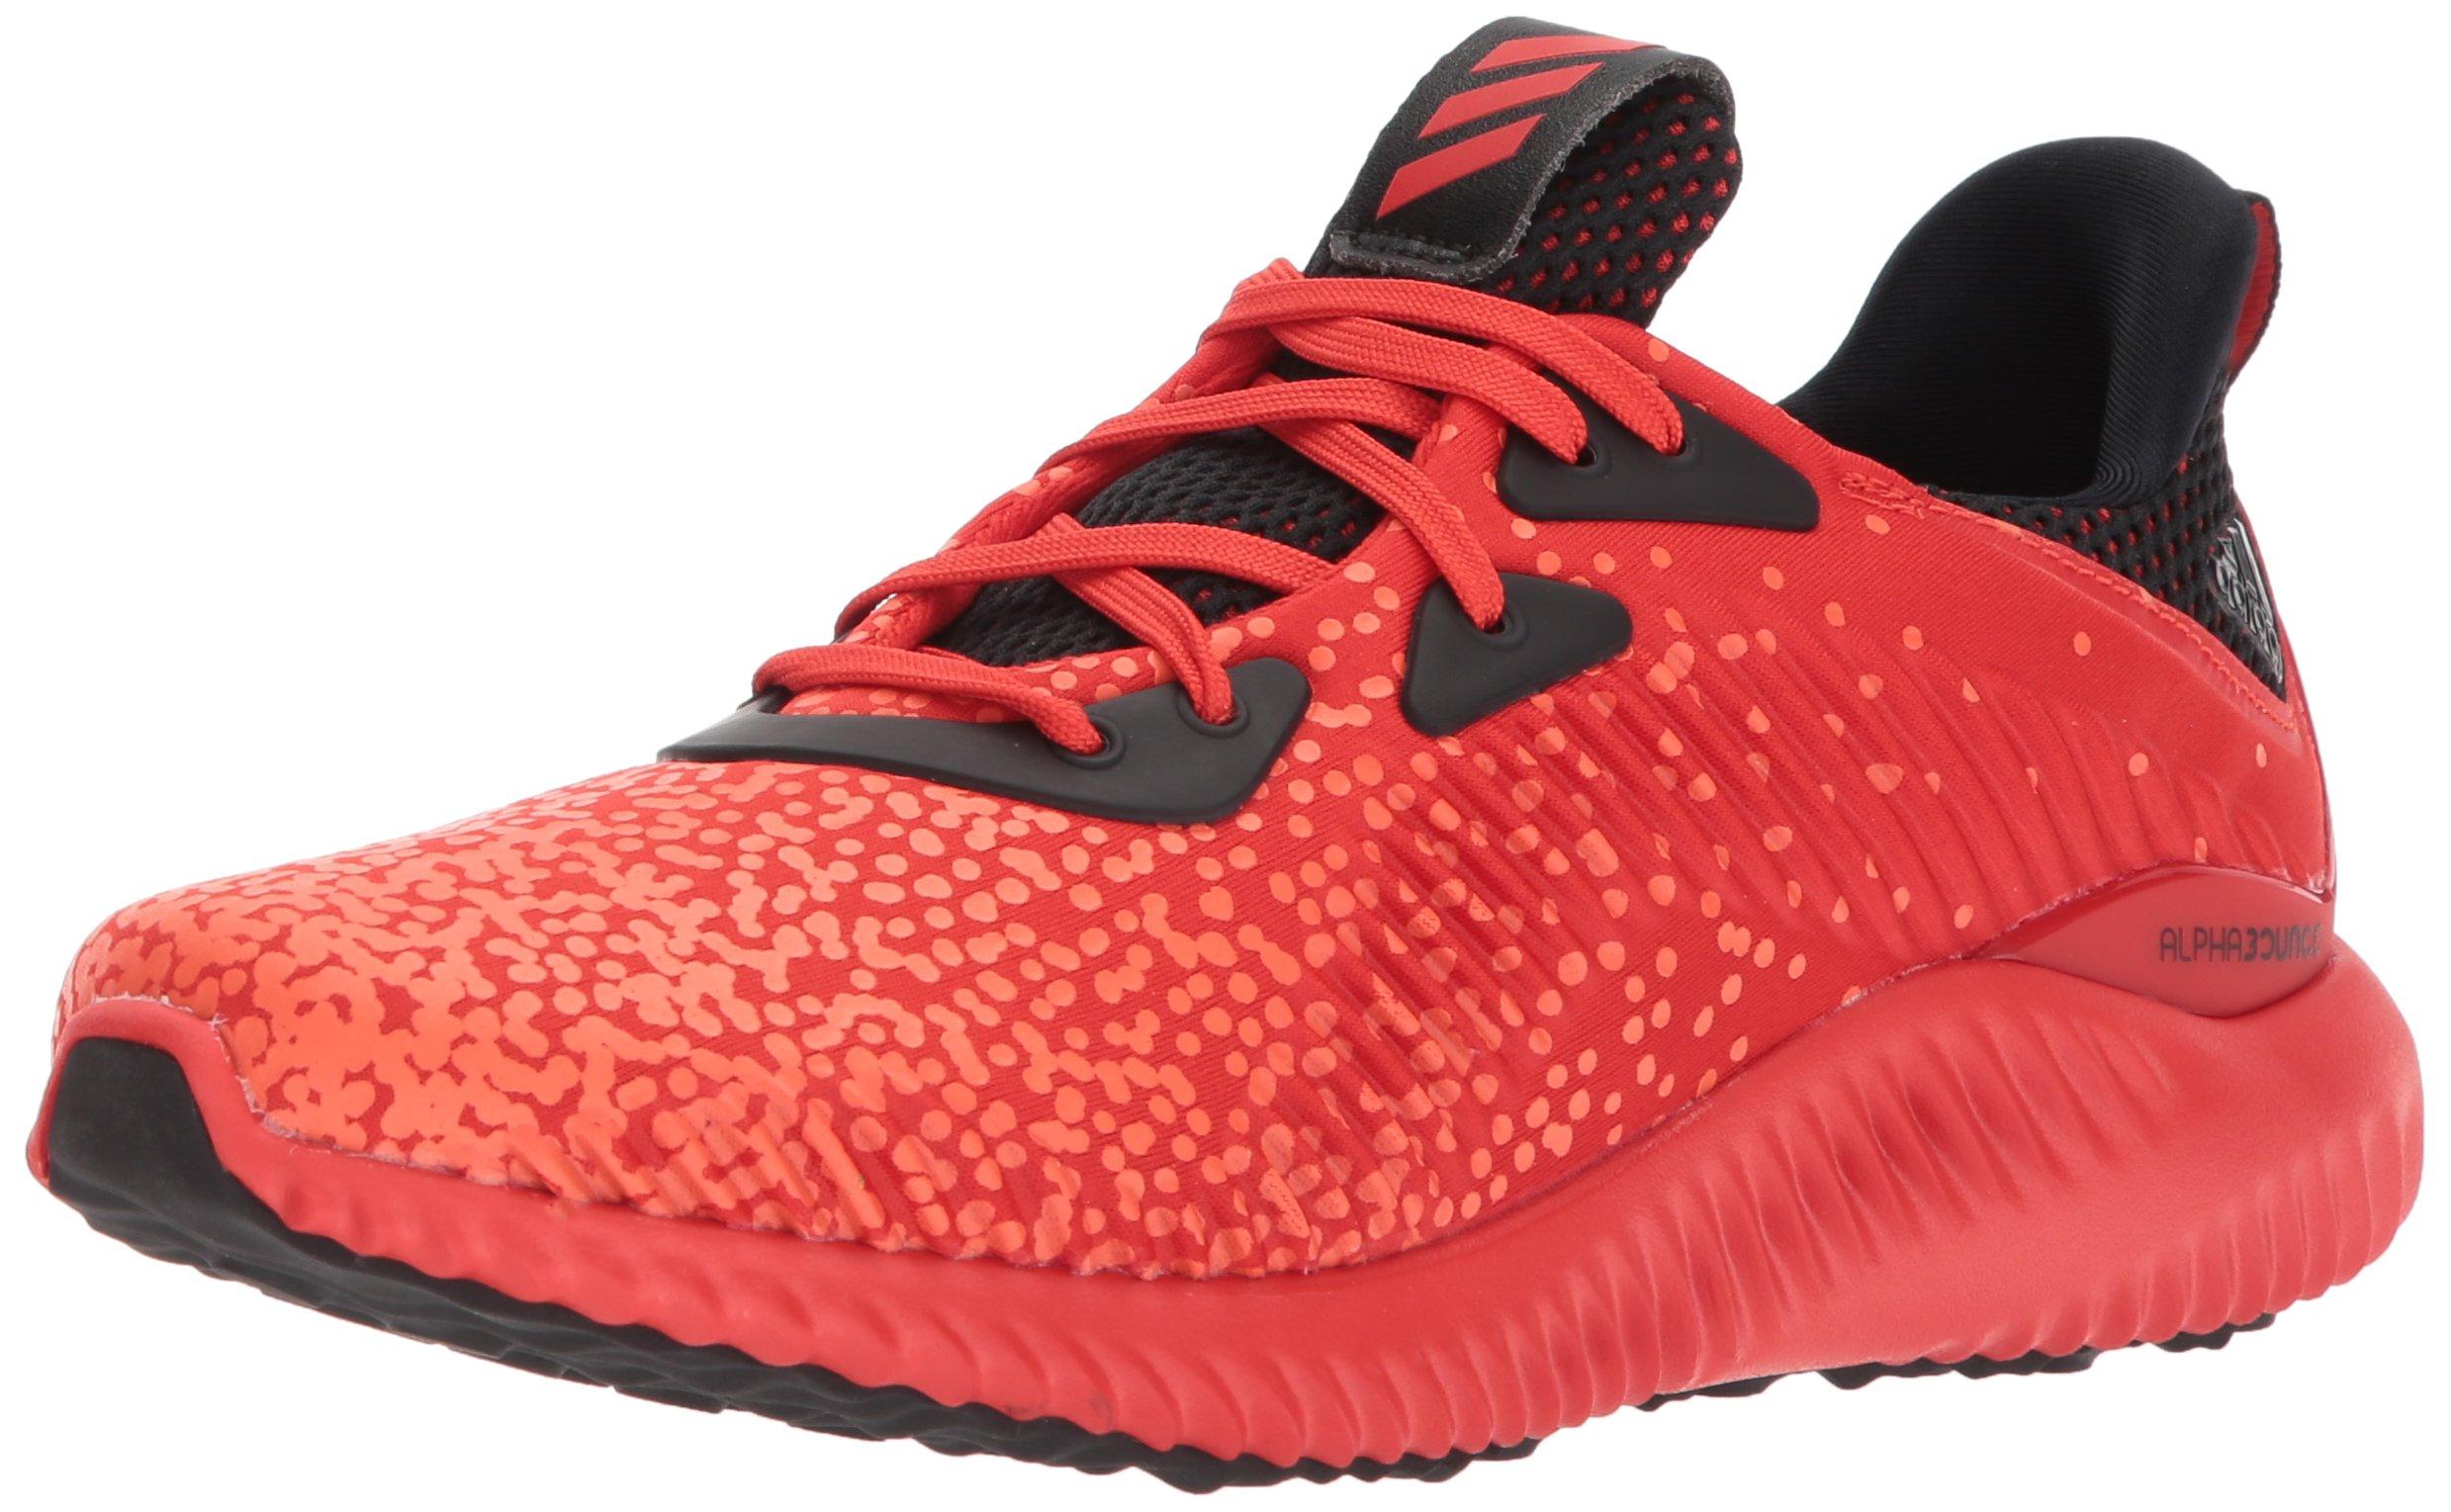 adidas Unisex-Kids Alphabounce 1 j, Core Red/Core Black/Warning, 4 Medium US Big Kid